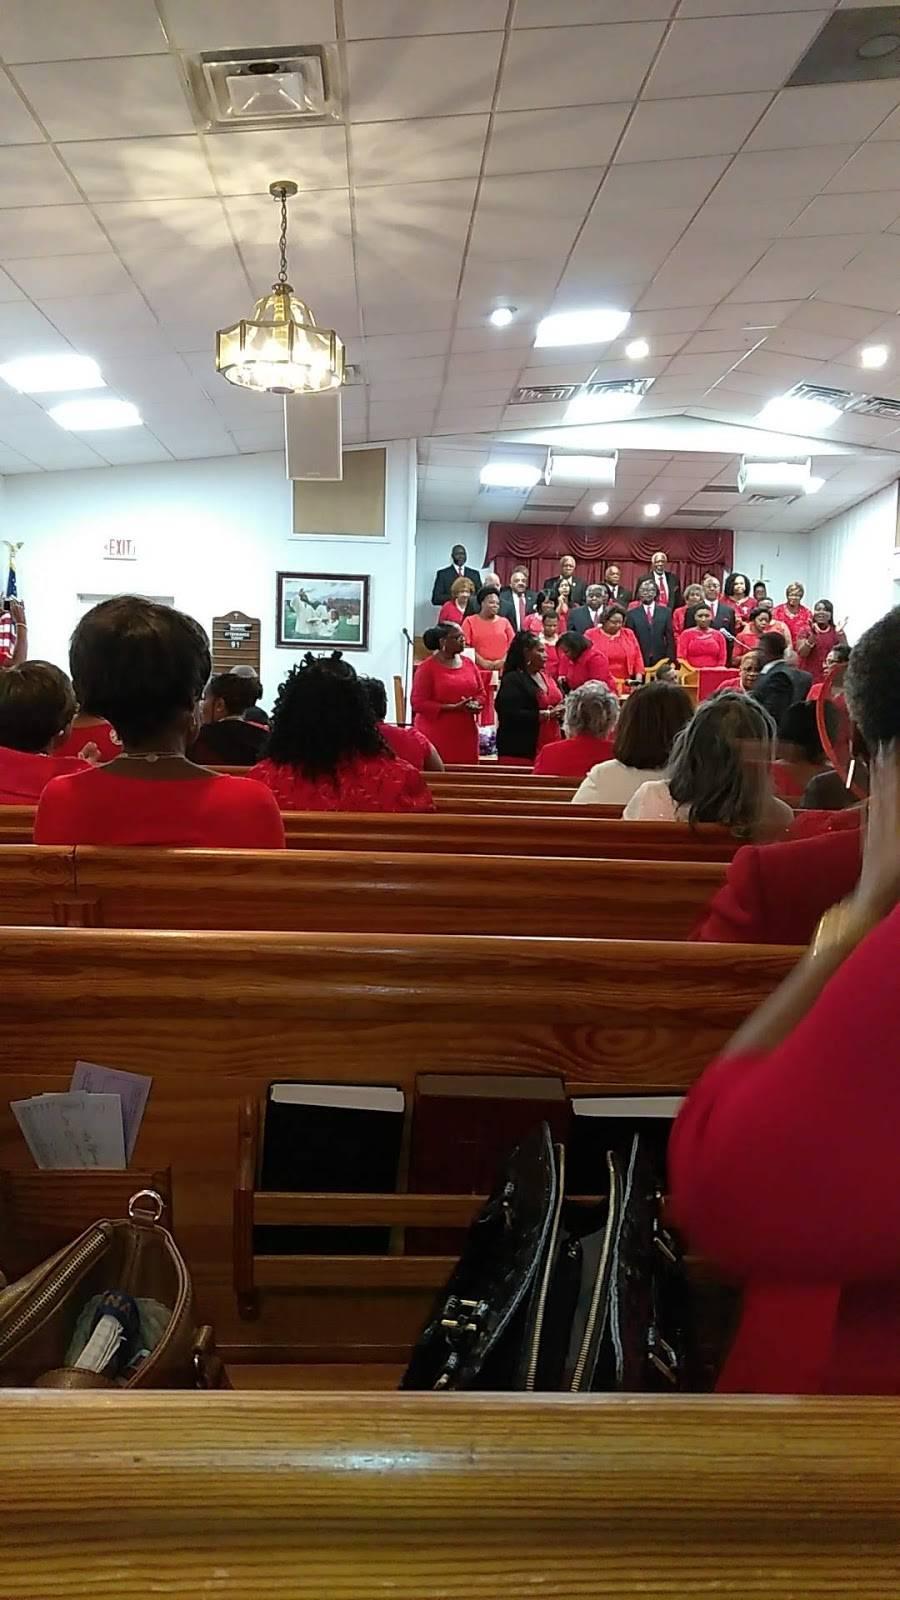 Forest Chapel Baptist Church - church  | Photo 2 of 2 | Address: 5150 Whatley Dr, Forest Park, GA 30297, USA | Phone: (404) 361-8327